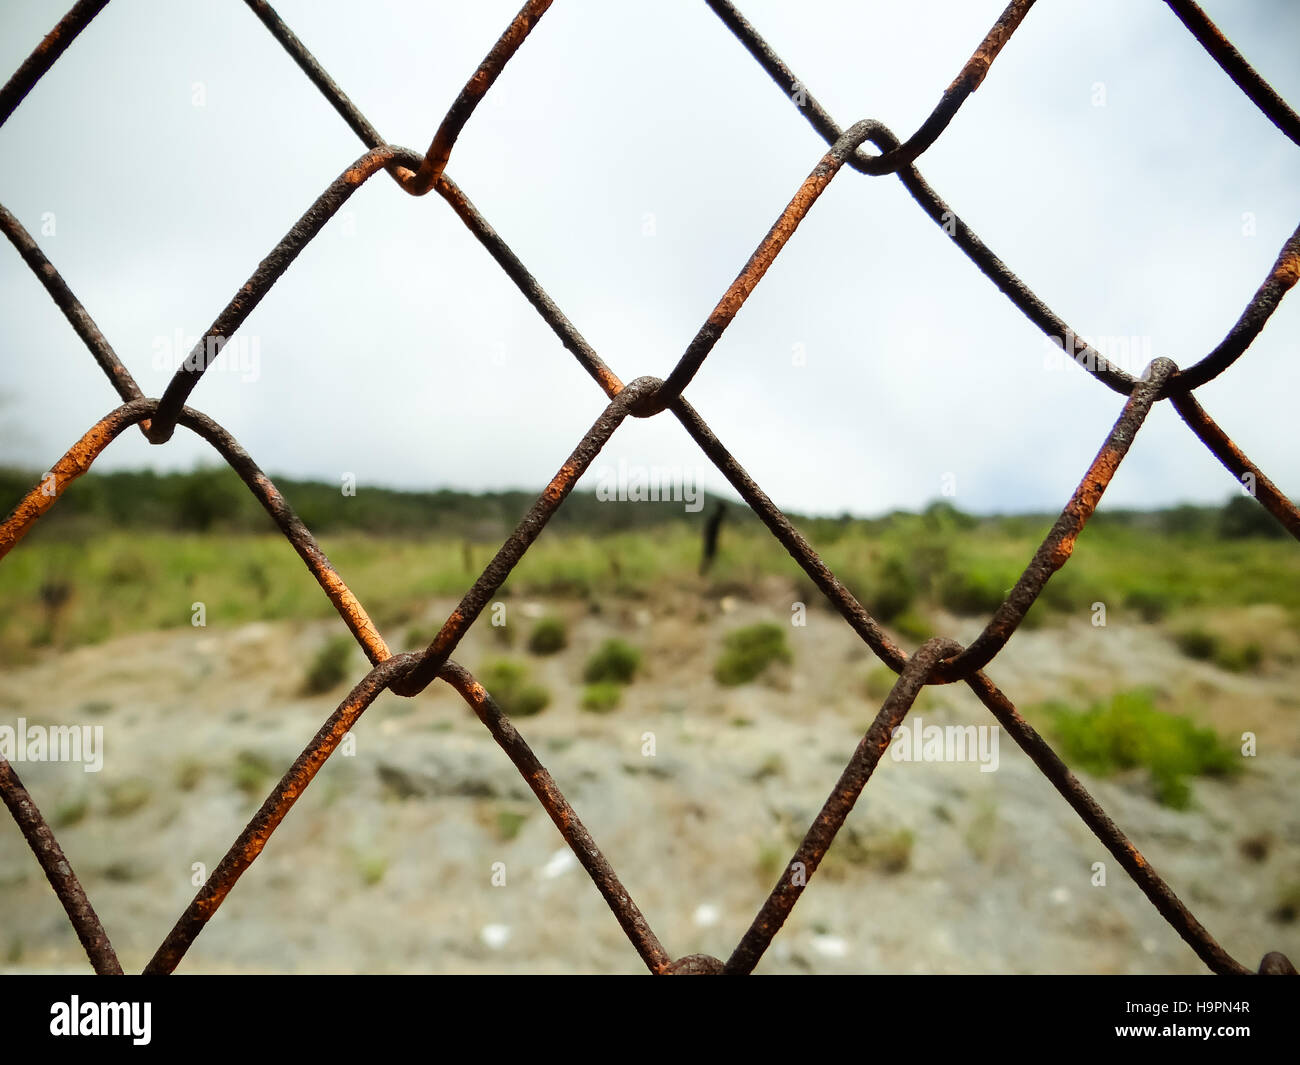 Iron Wire Stockfotos & Iron Wire Bilder - Alamy